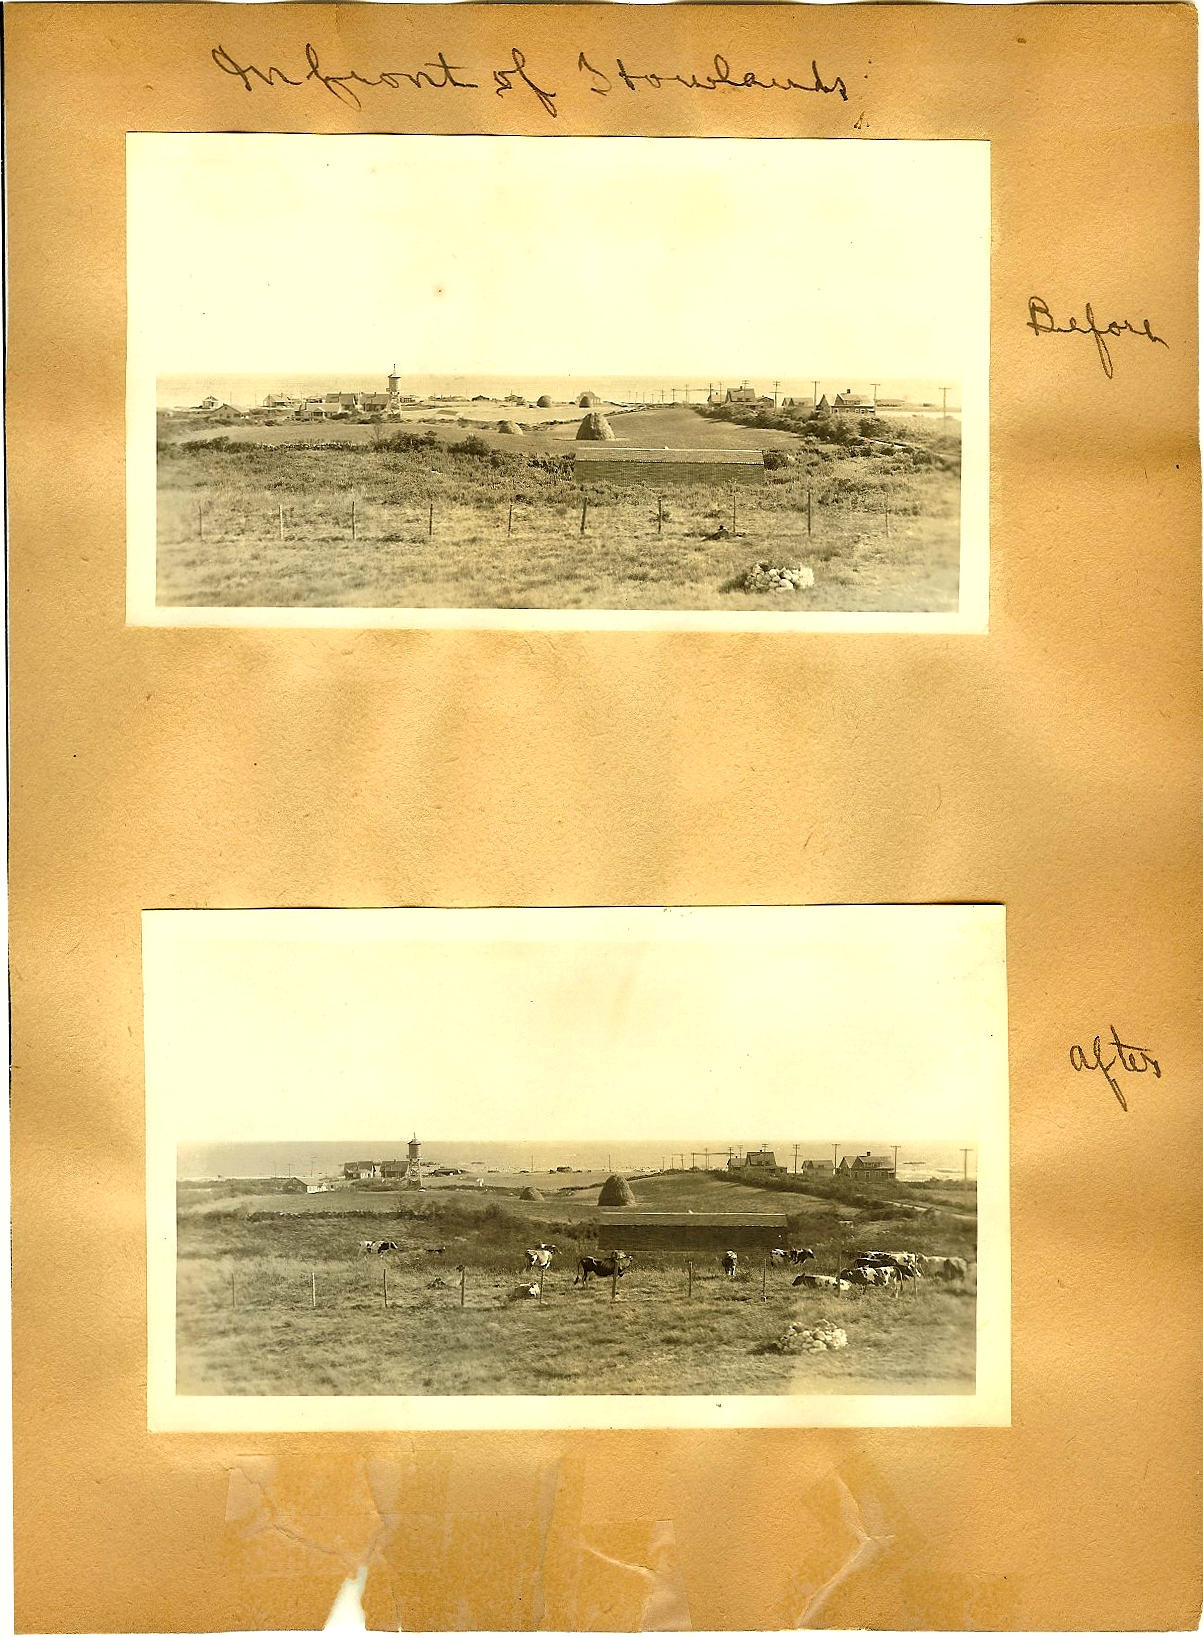 The 1938 Hurricane photos p15